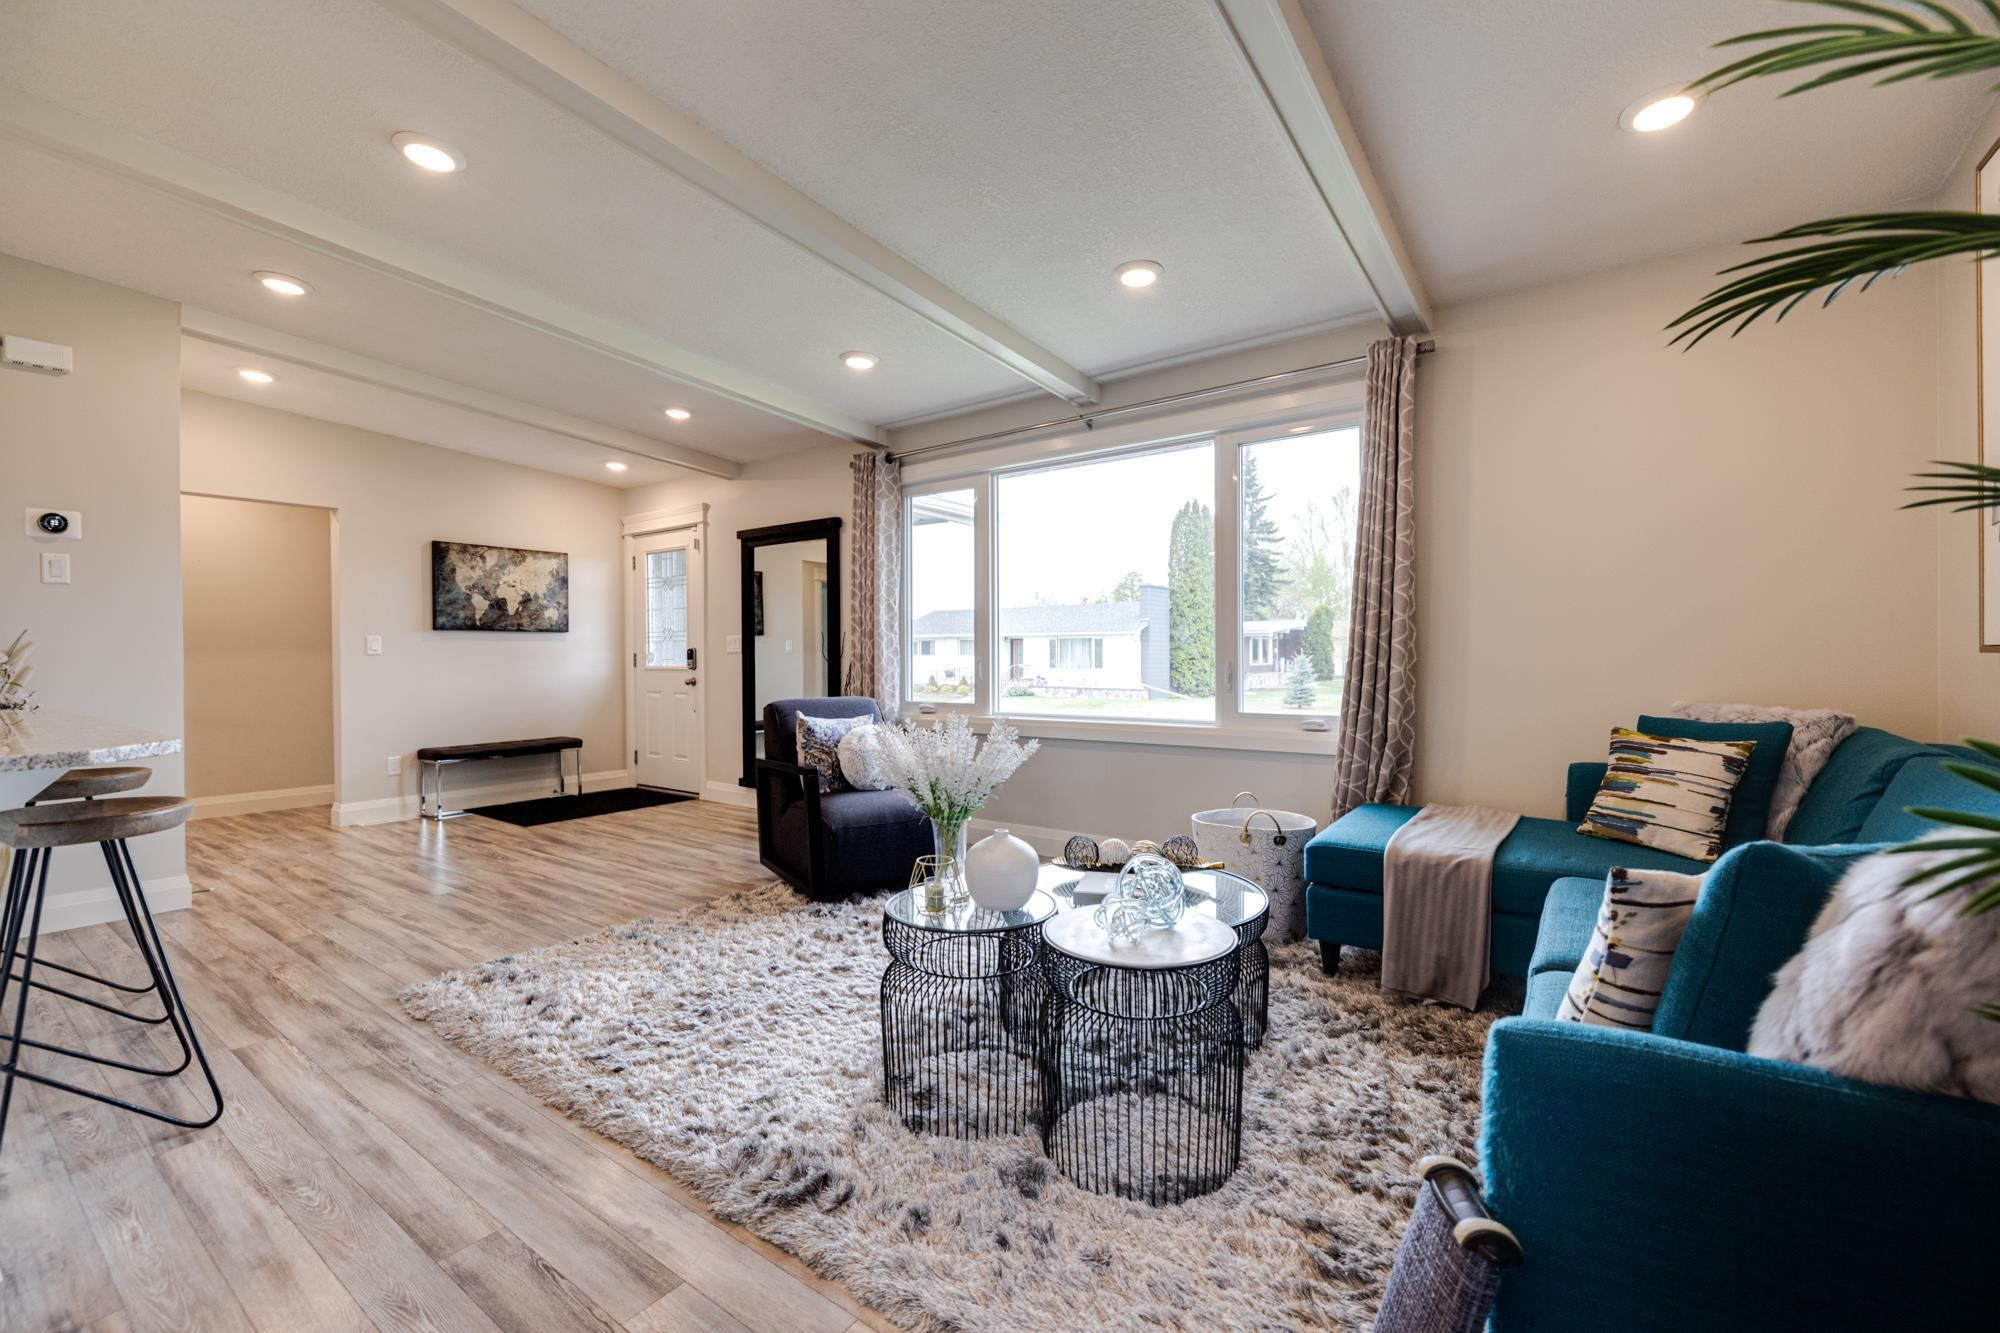 Main Photo: 6707 87 Avenue in Edmonton: Zone 18 House for sale : MLS®# E4245254